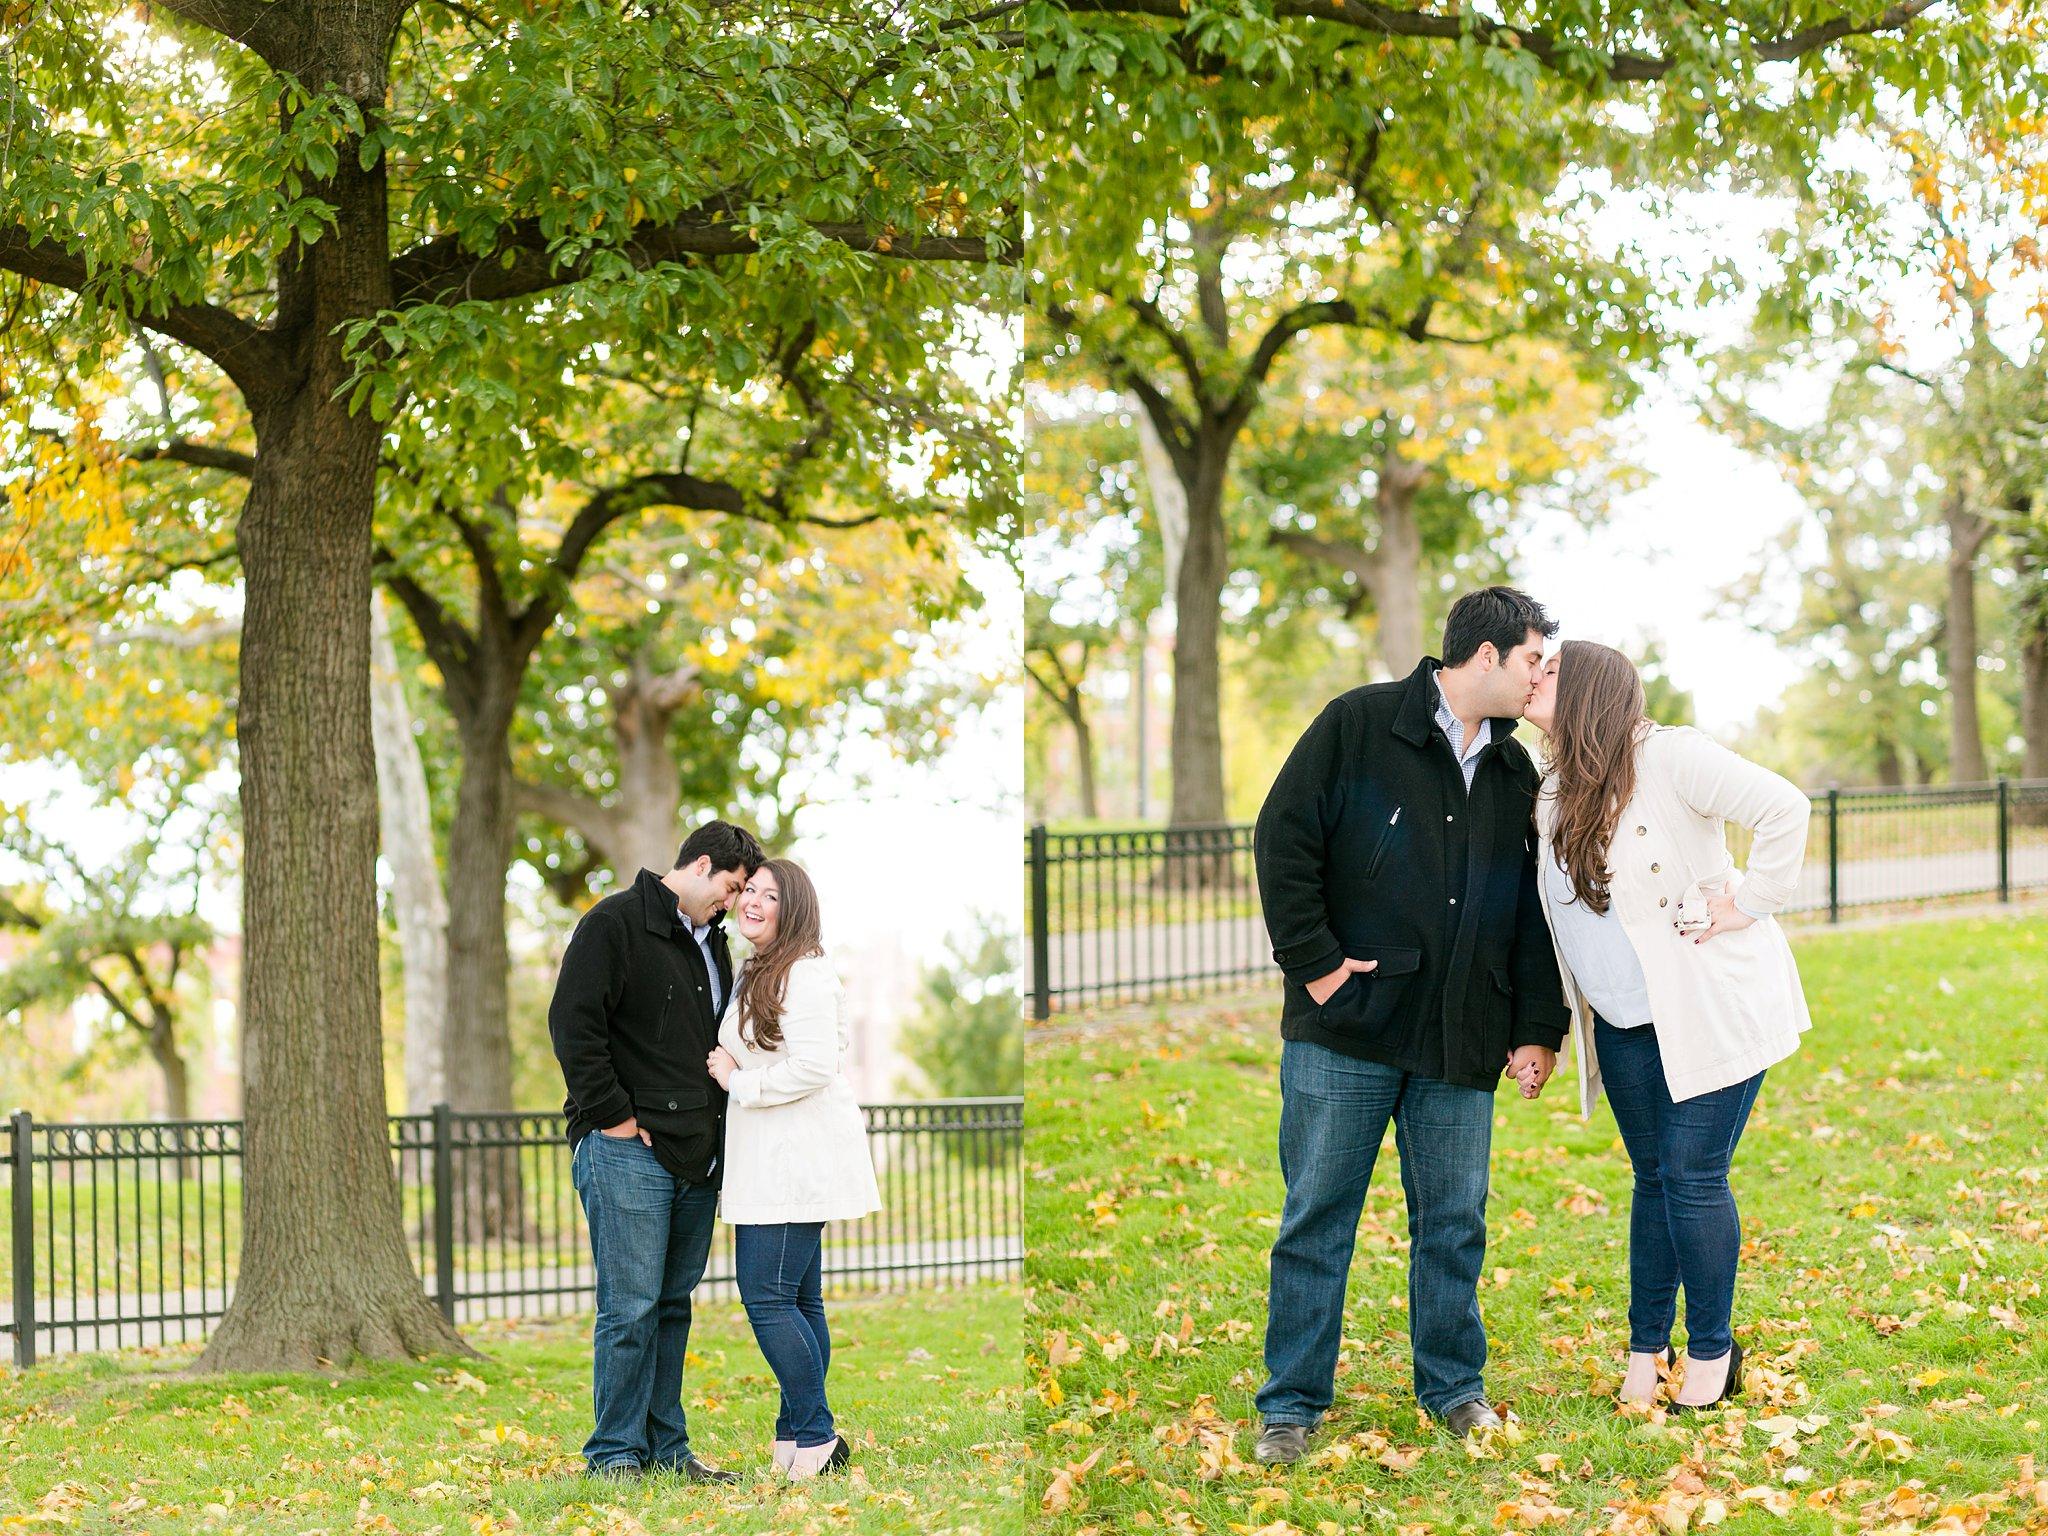 Baltimore Engagement Photos Fells Point Halie & Michael Megan Kelsey Photography-16.jpg